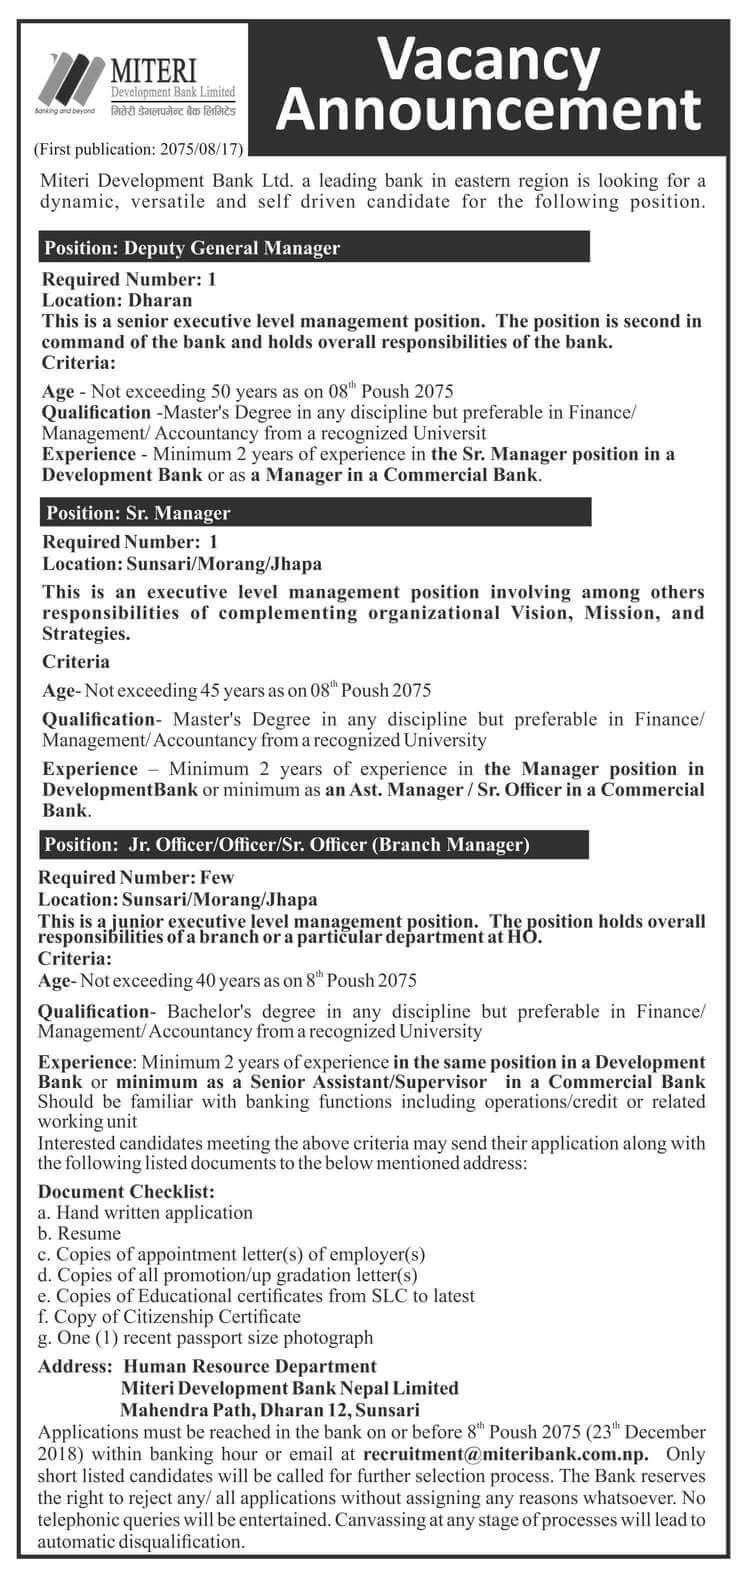 Vacancy Announcement from Miteri Development Bank Ltd.